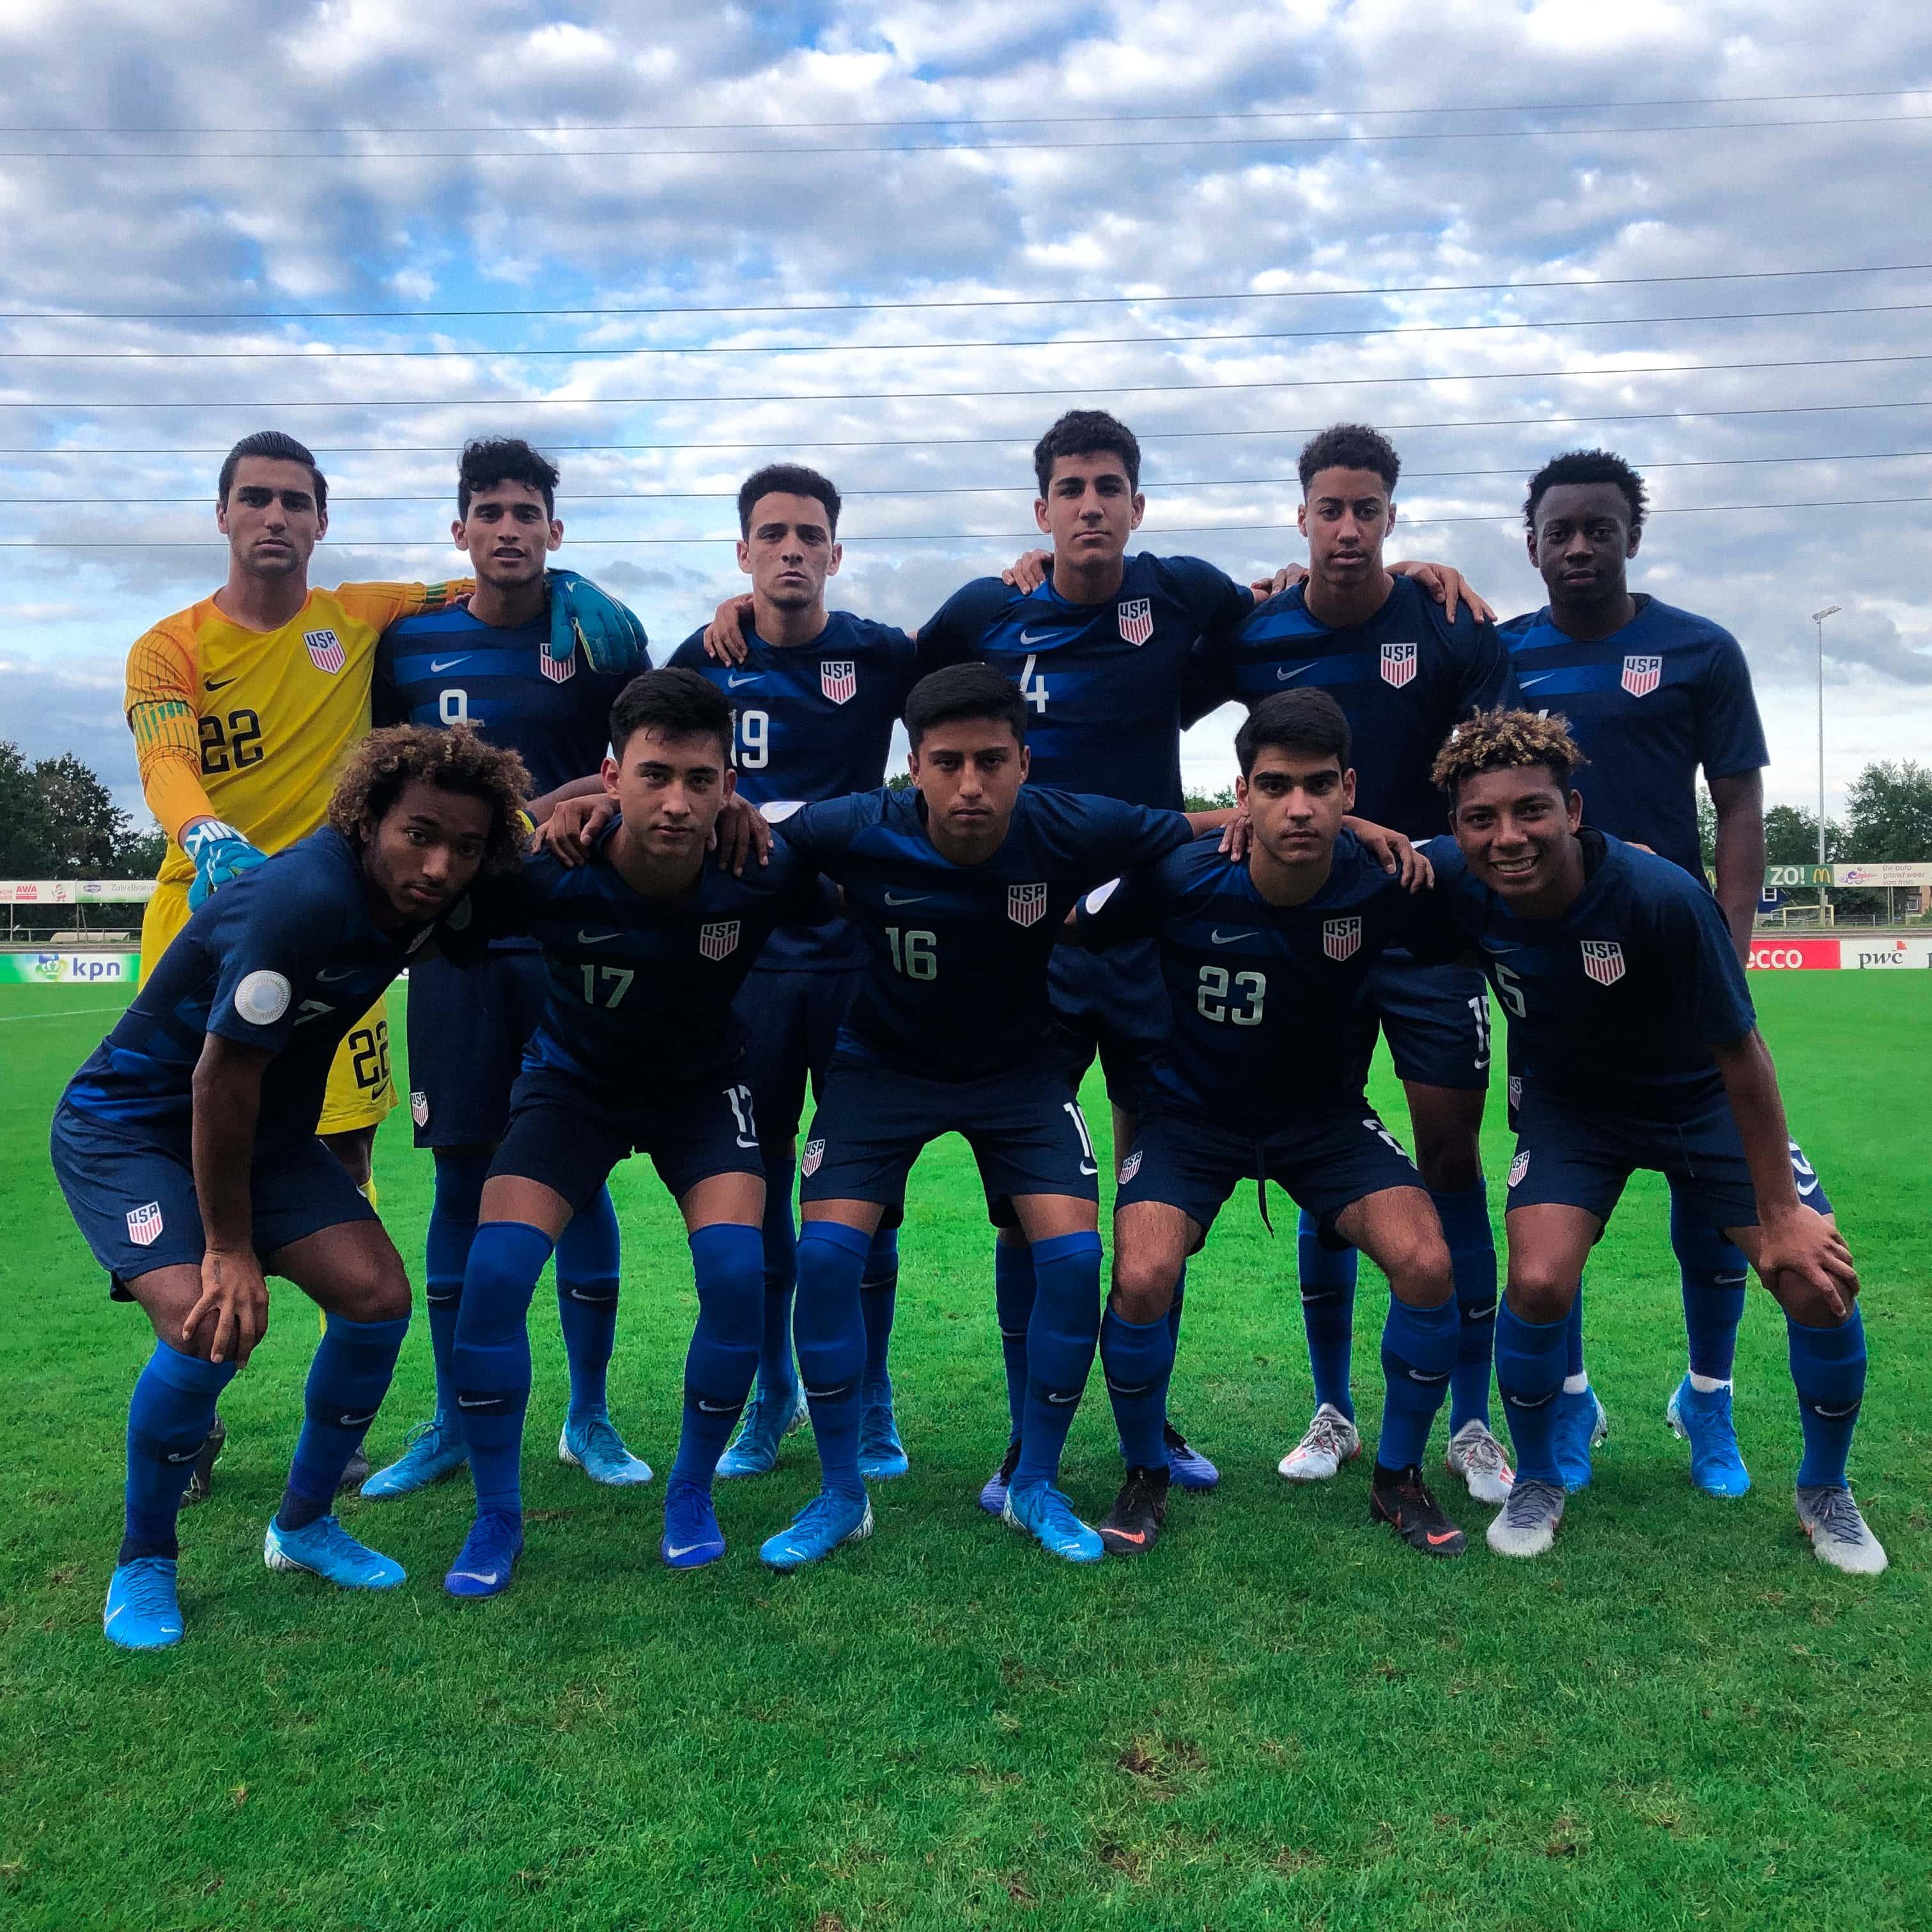 quality design ede5b 82bd3 U-17 Men's National Team | U.S. Soccer Official Website